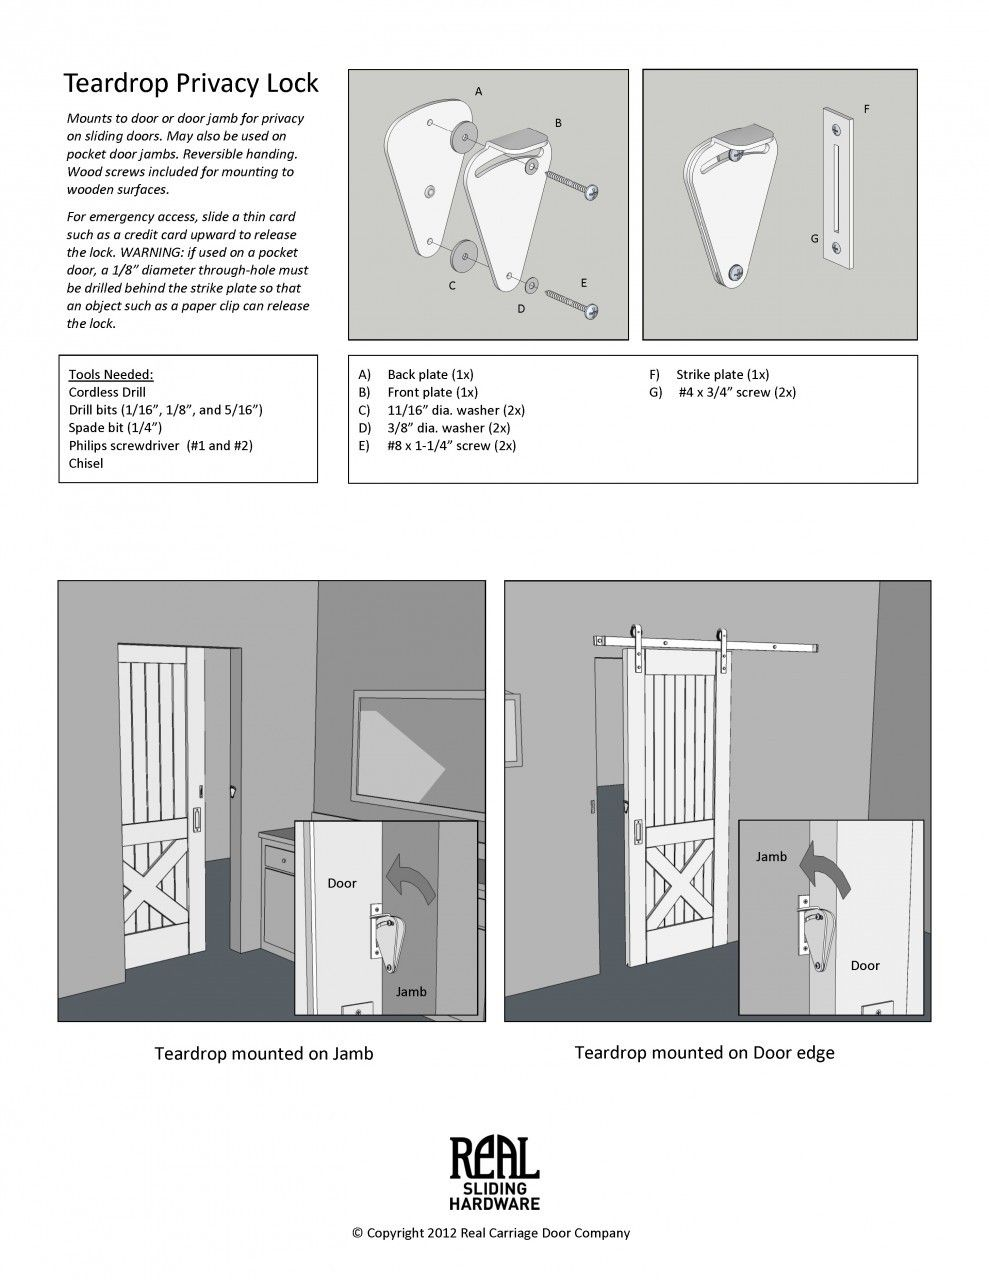 Teardrop privacy lock for sliding doors privacy lock for Barn door bathroom privacy